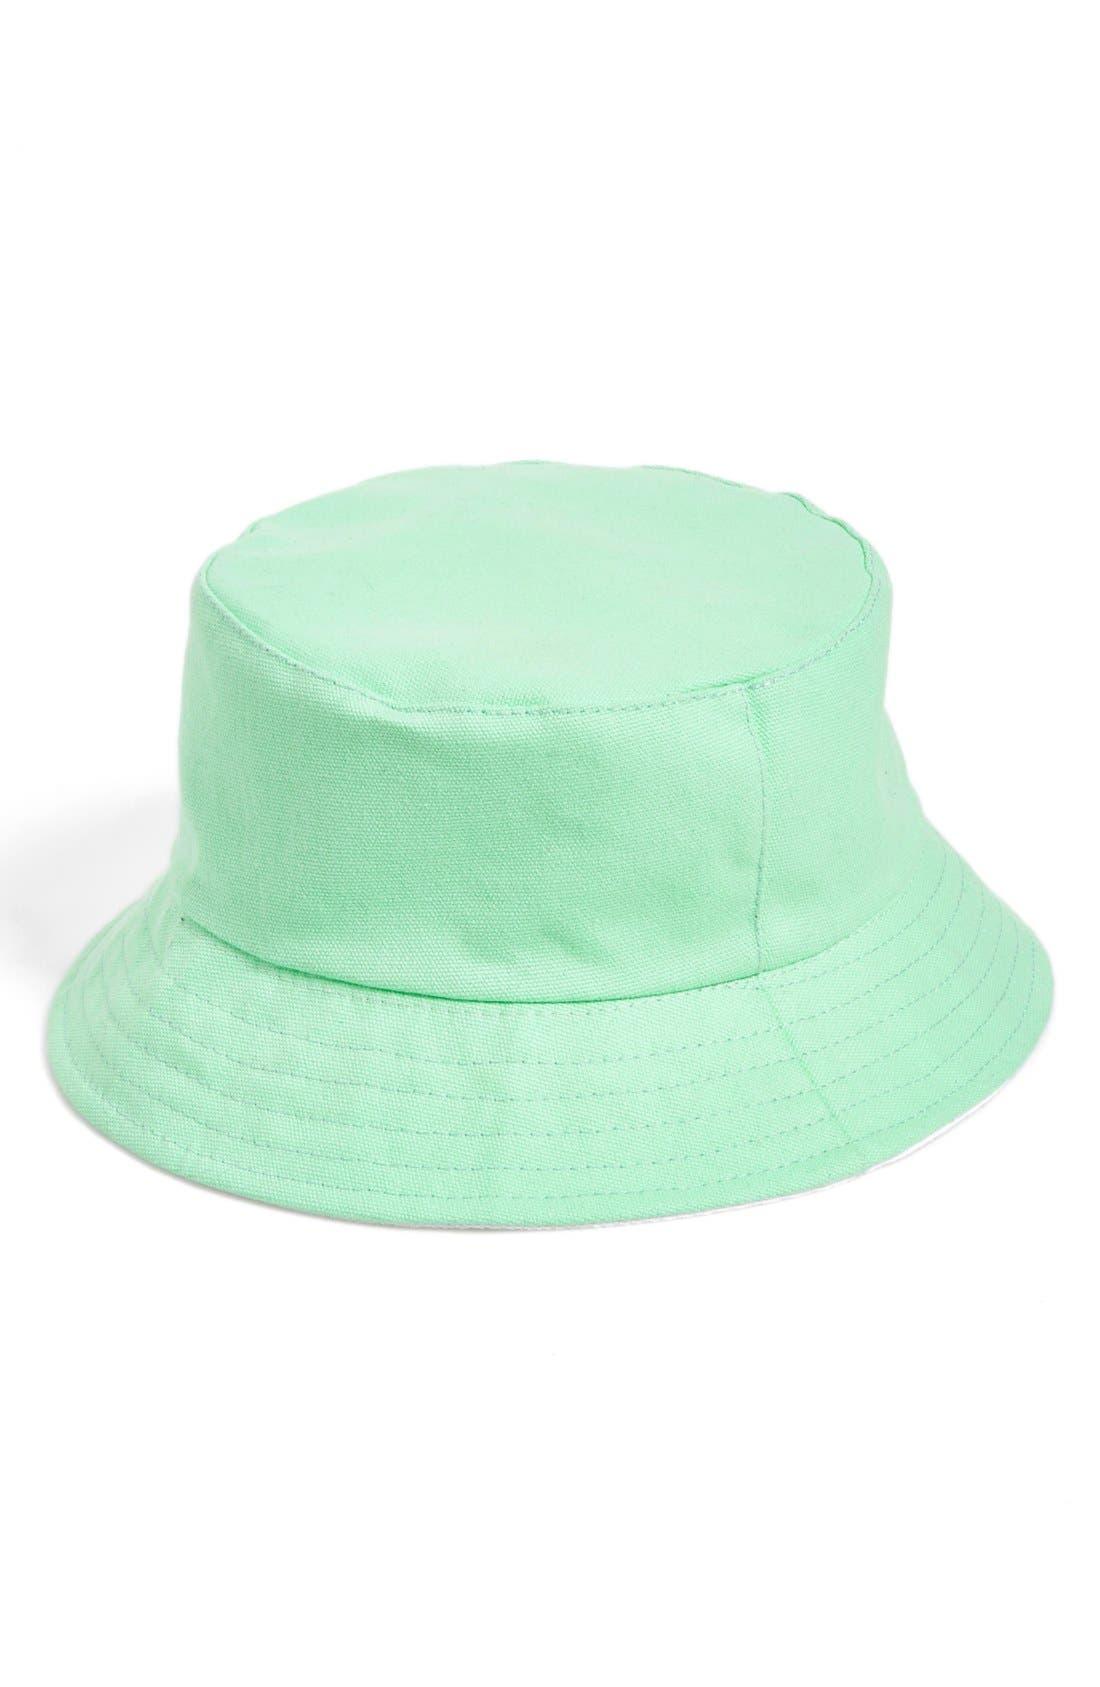 Main Image - Amici Accessories Reversible Bucket Hat (Juniors)